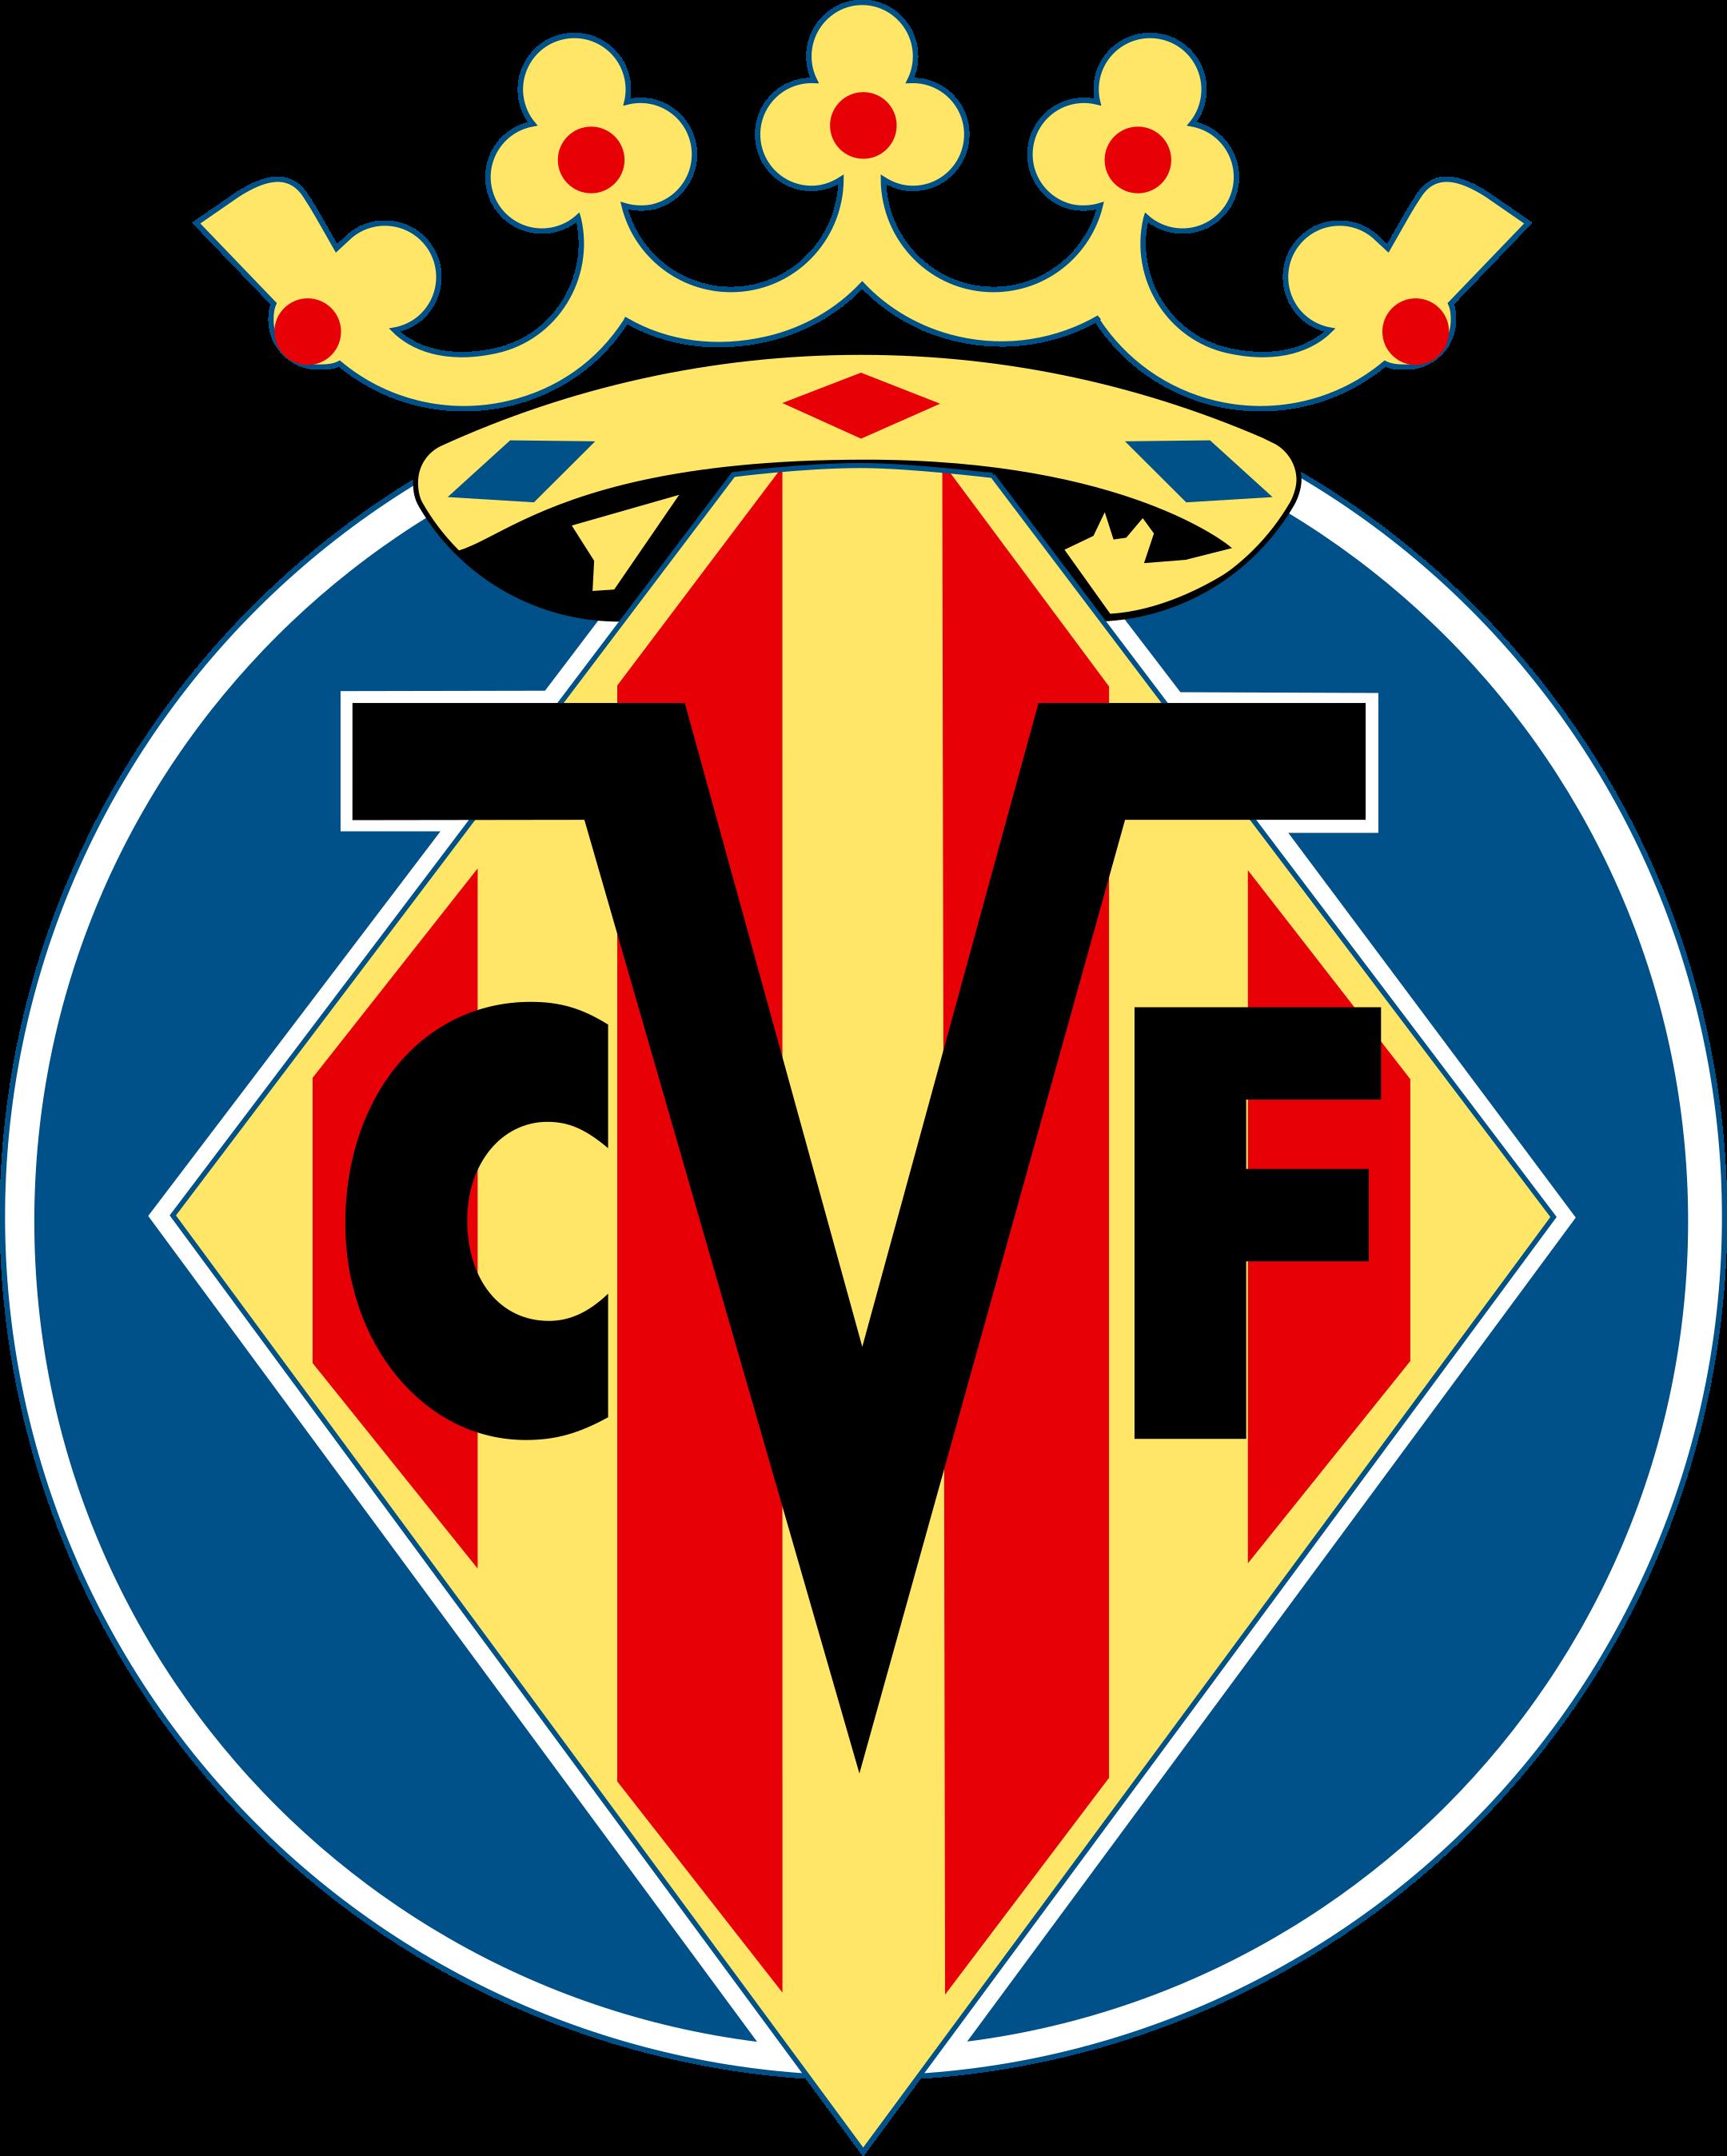 villarreal cf logo 1 - Villarreal CF Logo